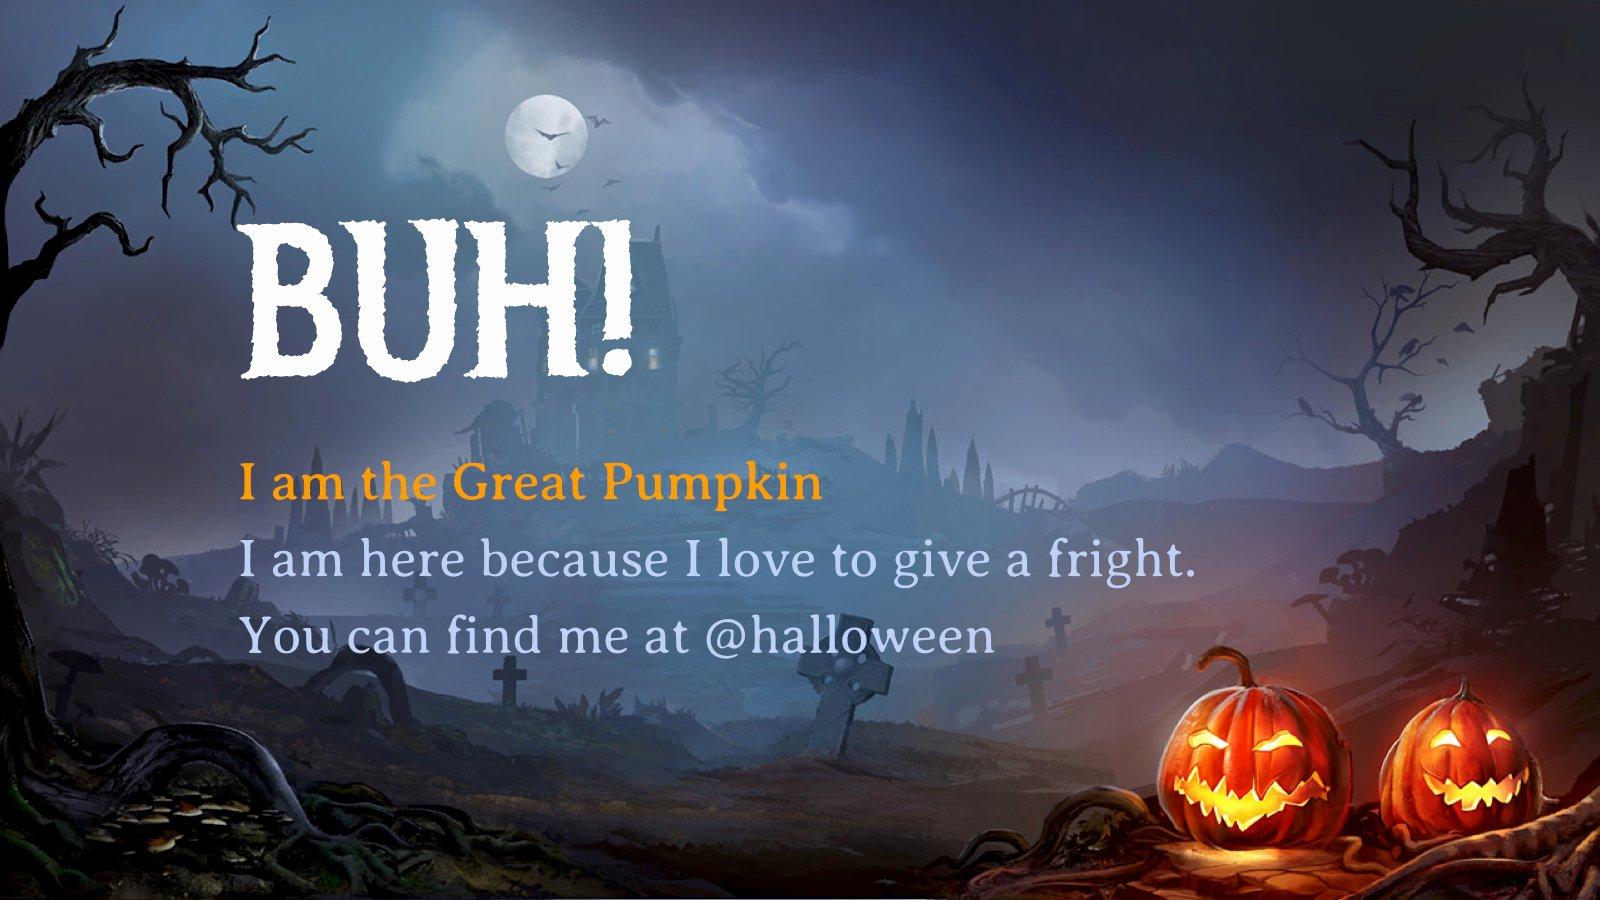 Free Halloween Powerpoint Templates Inspirational Halloween 2017 Free Powerpoint Template & Google Slides theme Freebie Supply